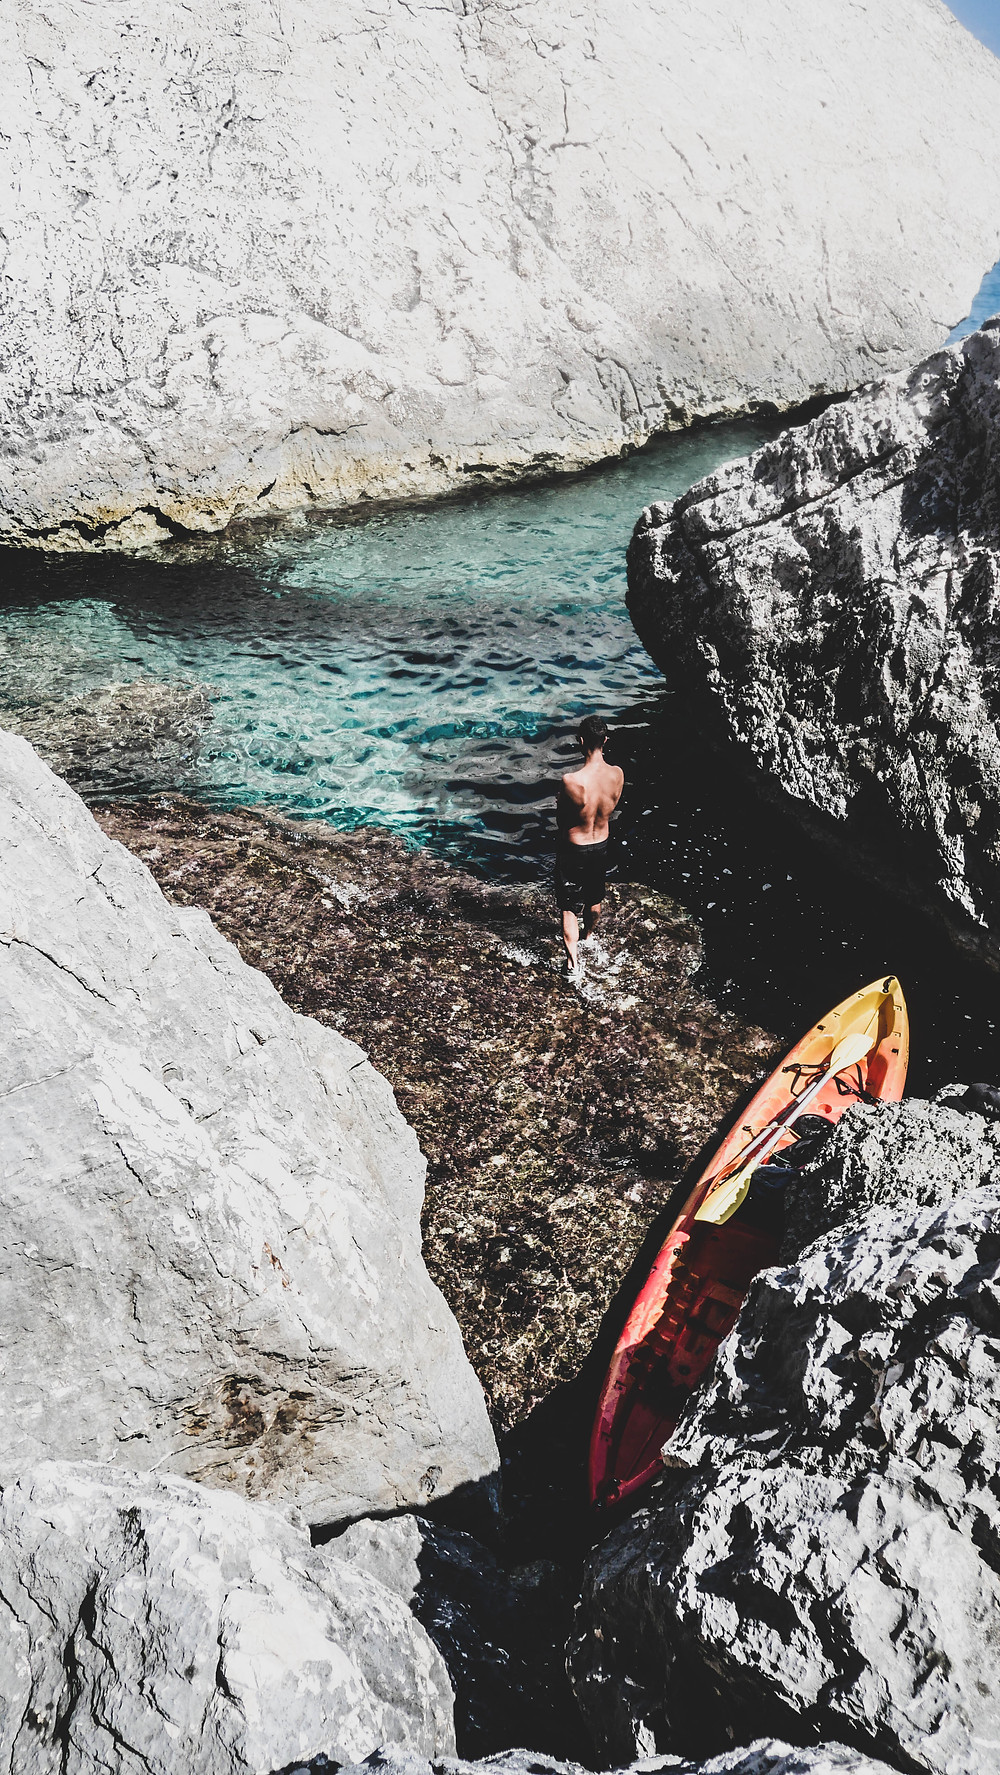 Kayak Cala Luna - 1 semaine de Roadtrip en Sardaigne - Céline Descroix